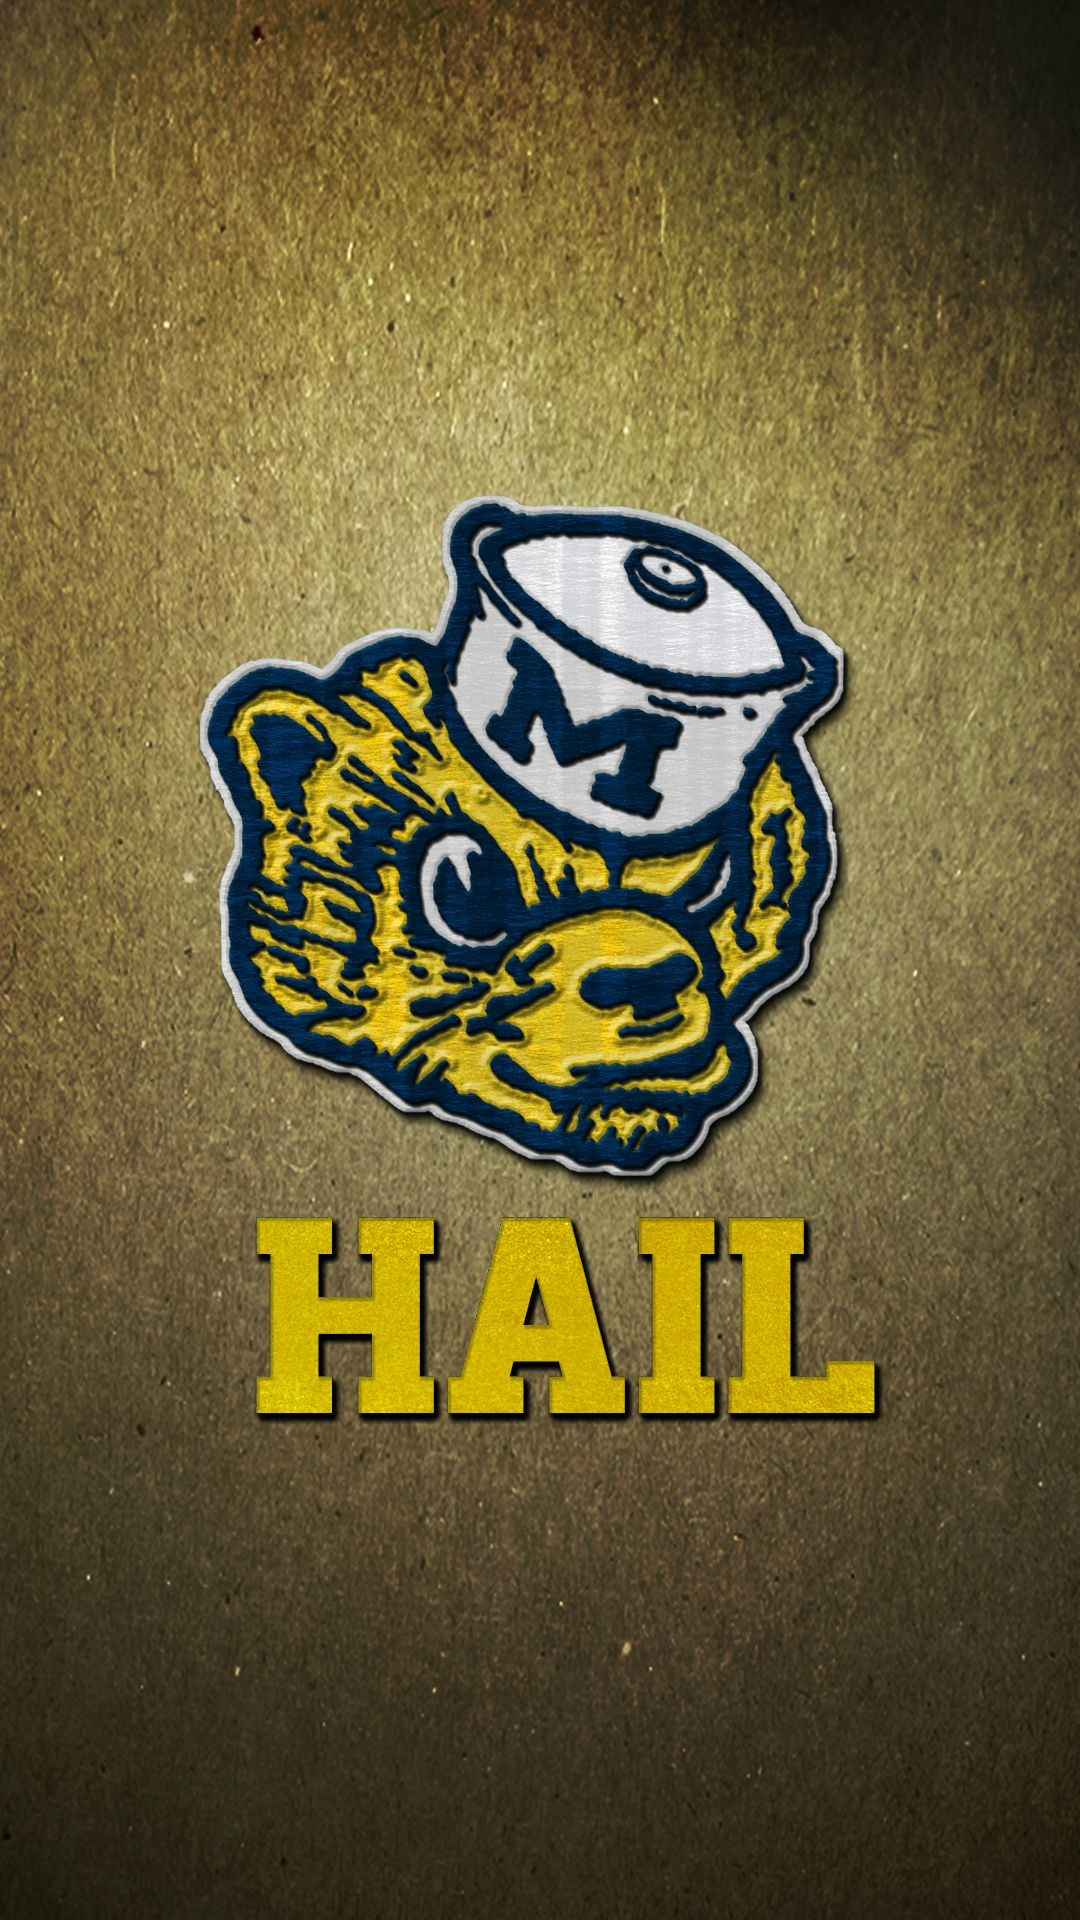 University of Michigan Football Wallpaper SuperSweet Football | HD  Wallpapers | Pinterest | Michigan wolverines and Wallpaper